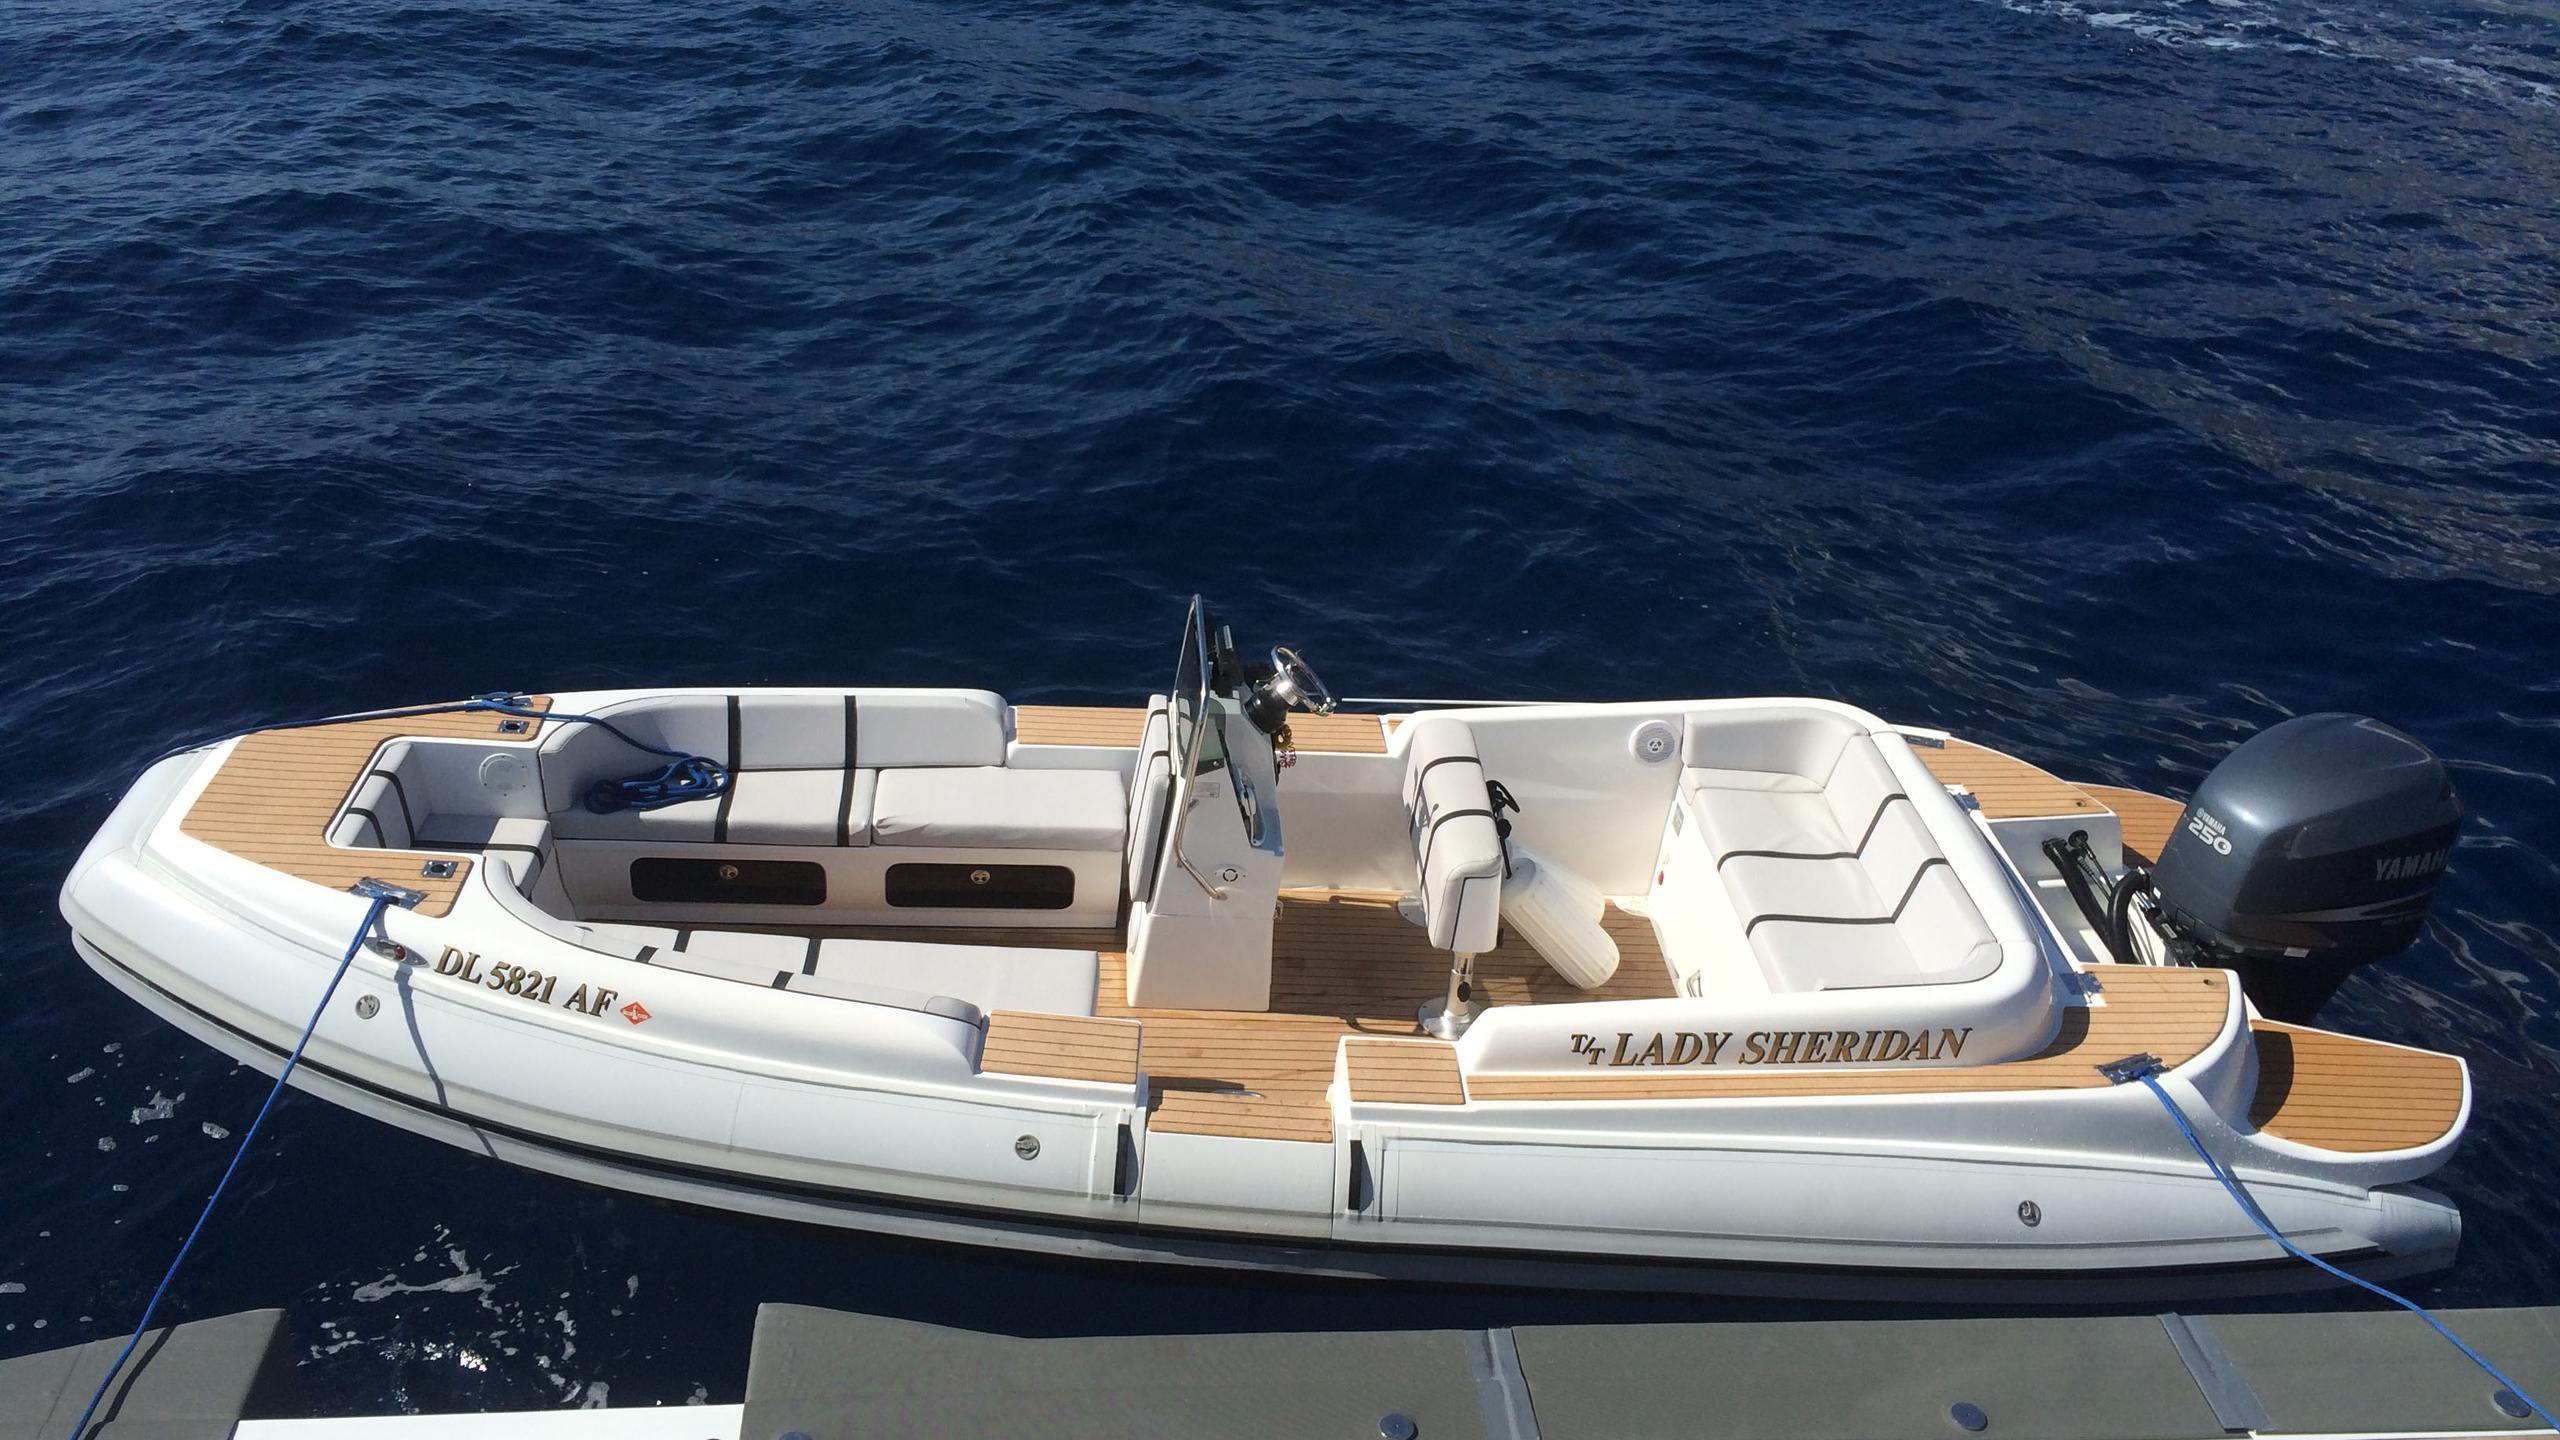 lady-sheridan-yacht-tender